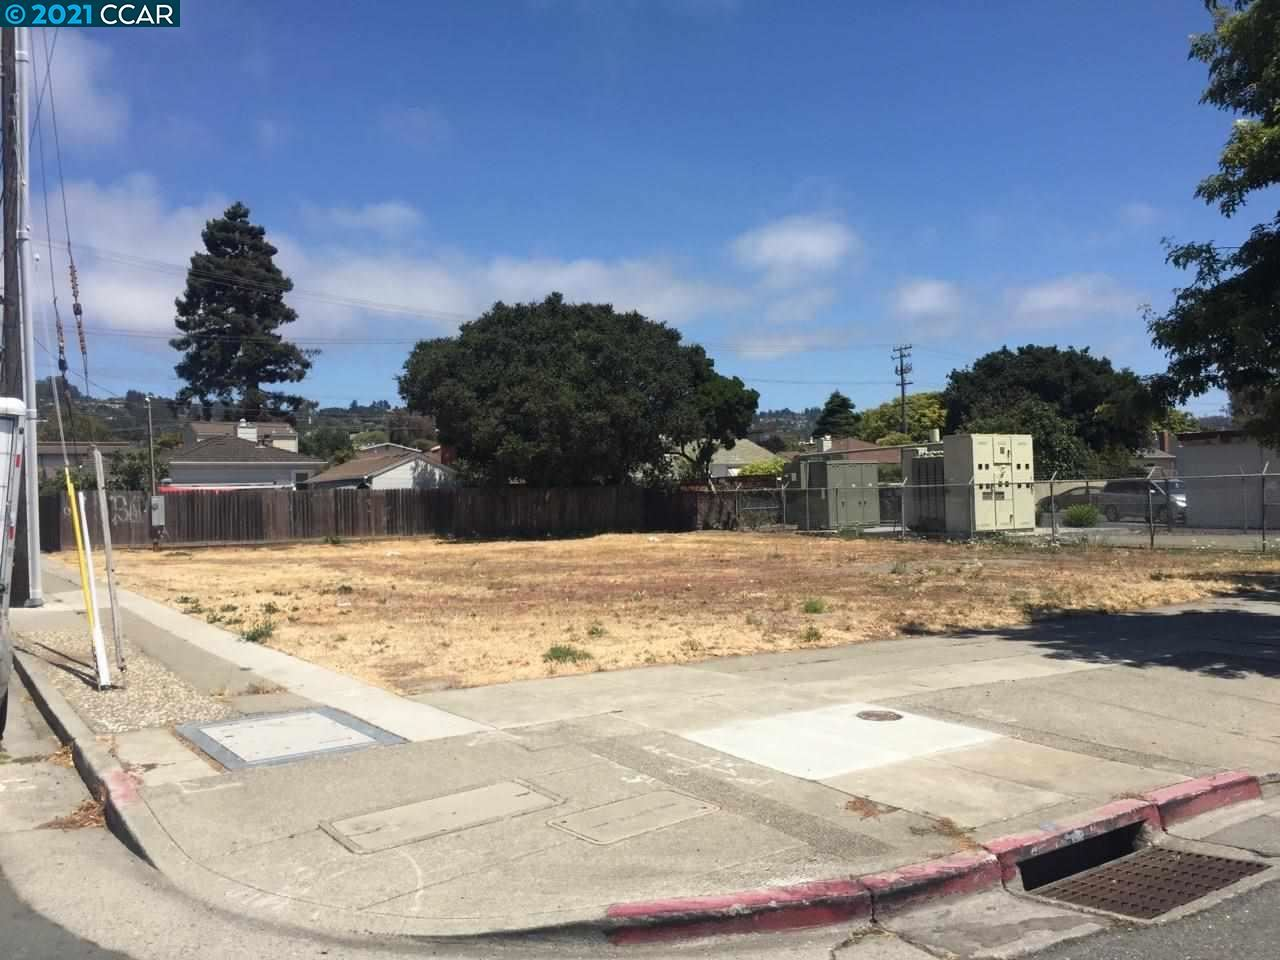 Photo of 10496 San Pablo Ave, El Cerrito, CA 94530 (MLS # 40960494)